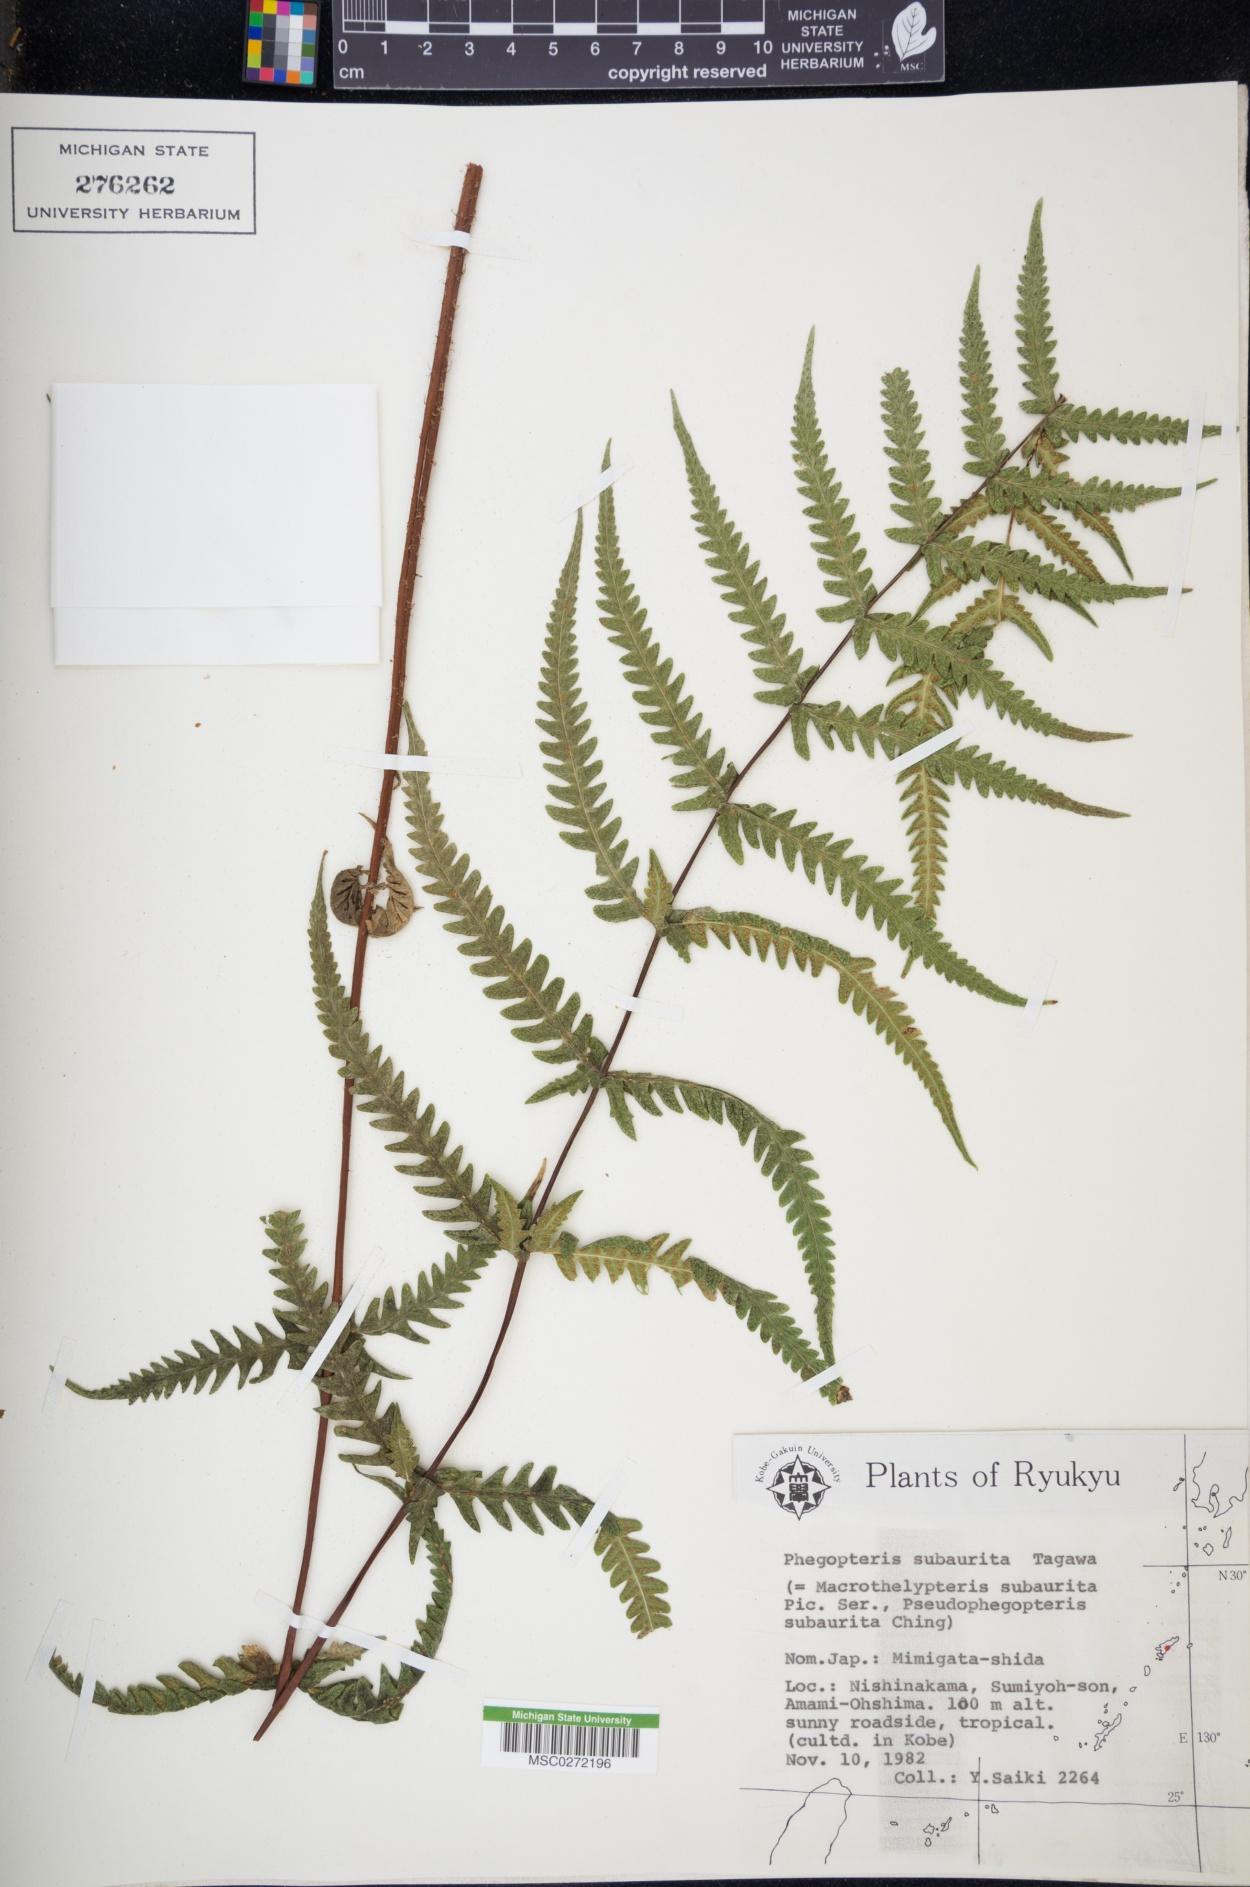 Phegopteris subaurita image